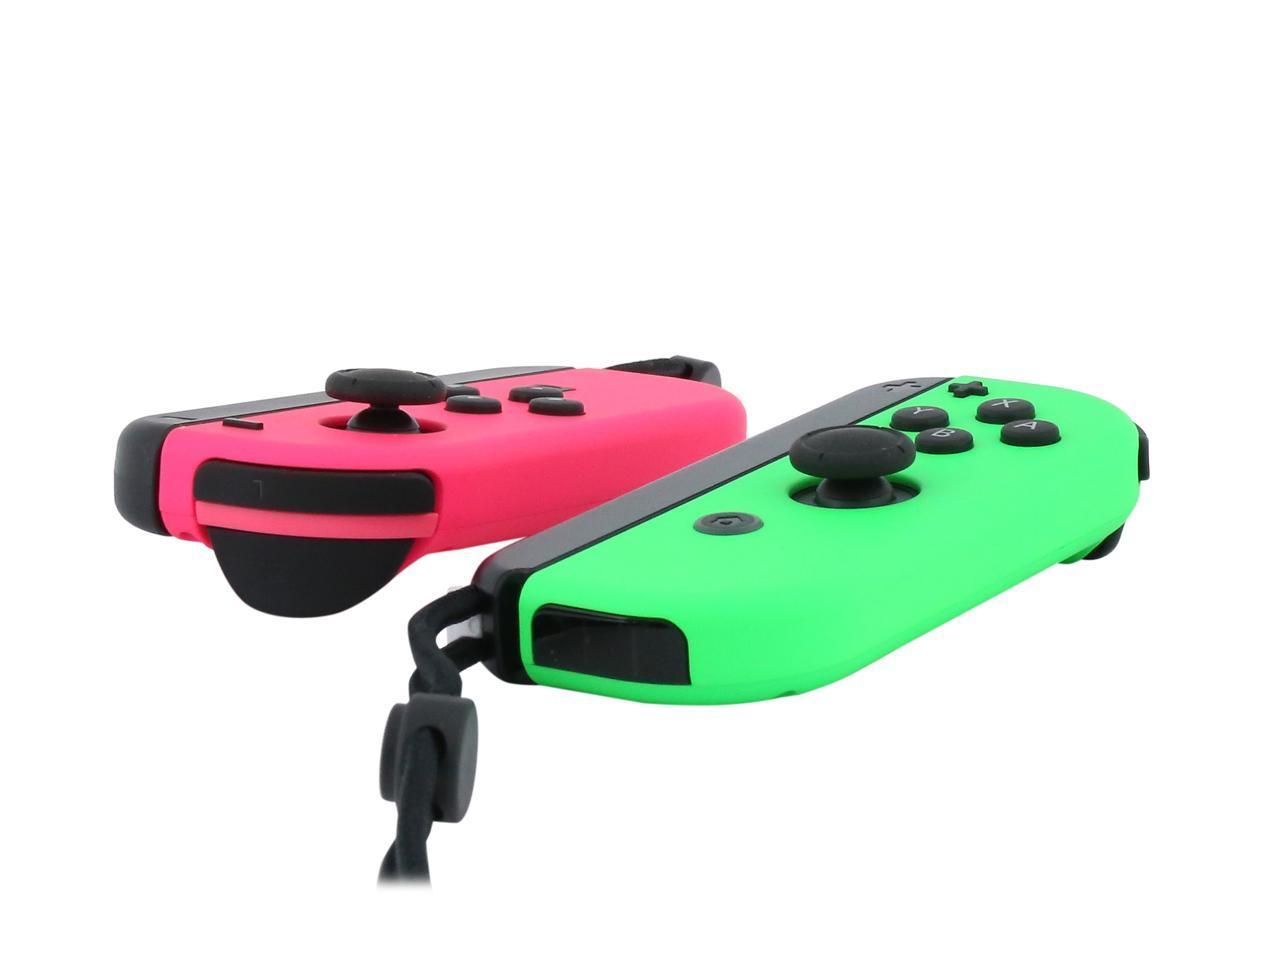 Nintendo Joy-Con (L/R) - Neon Pink / Neon Green - Newegg.com